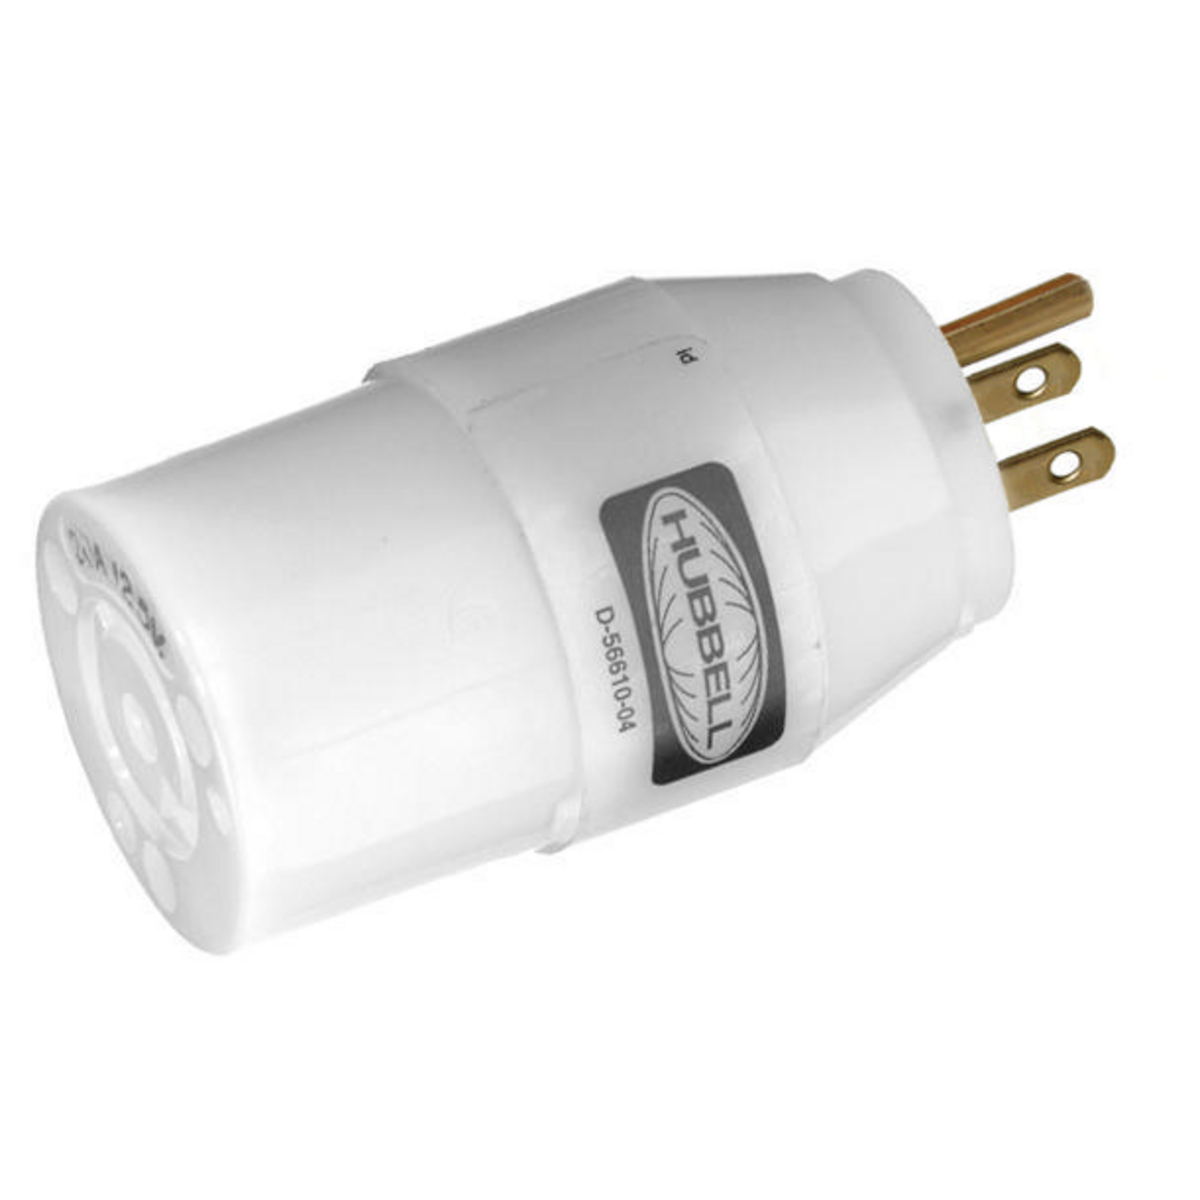 Hubbell HBL2128ADAP NEMA 5-15P TO NEMA L5-20R